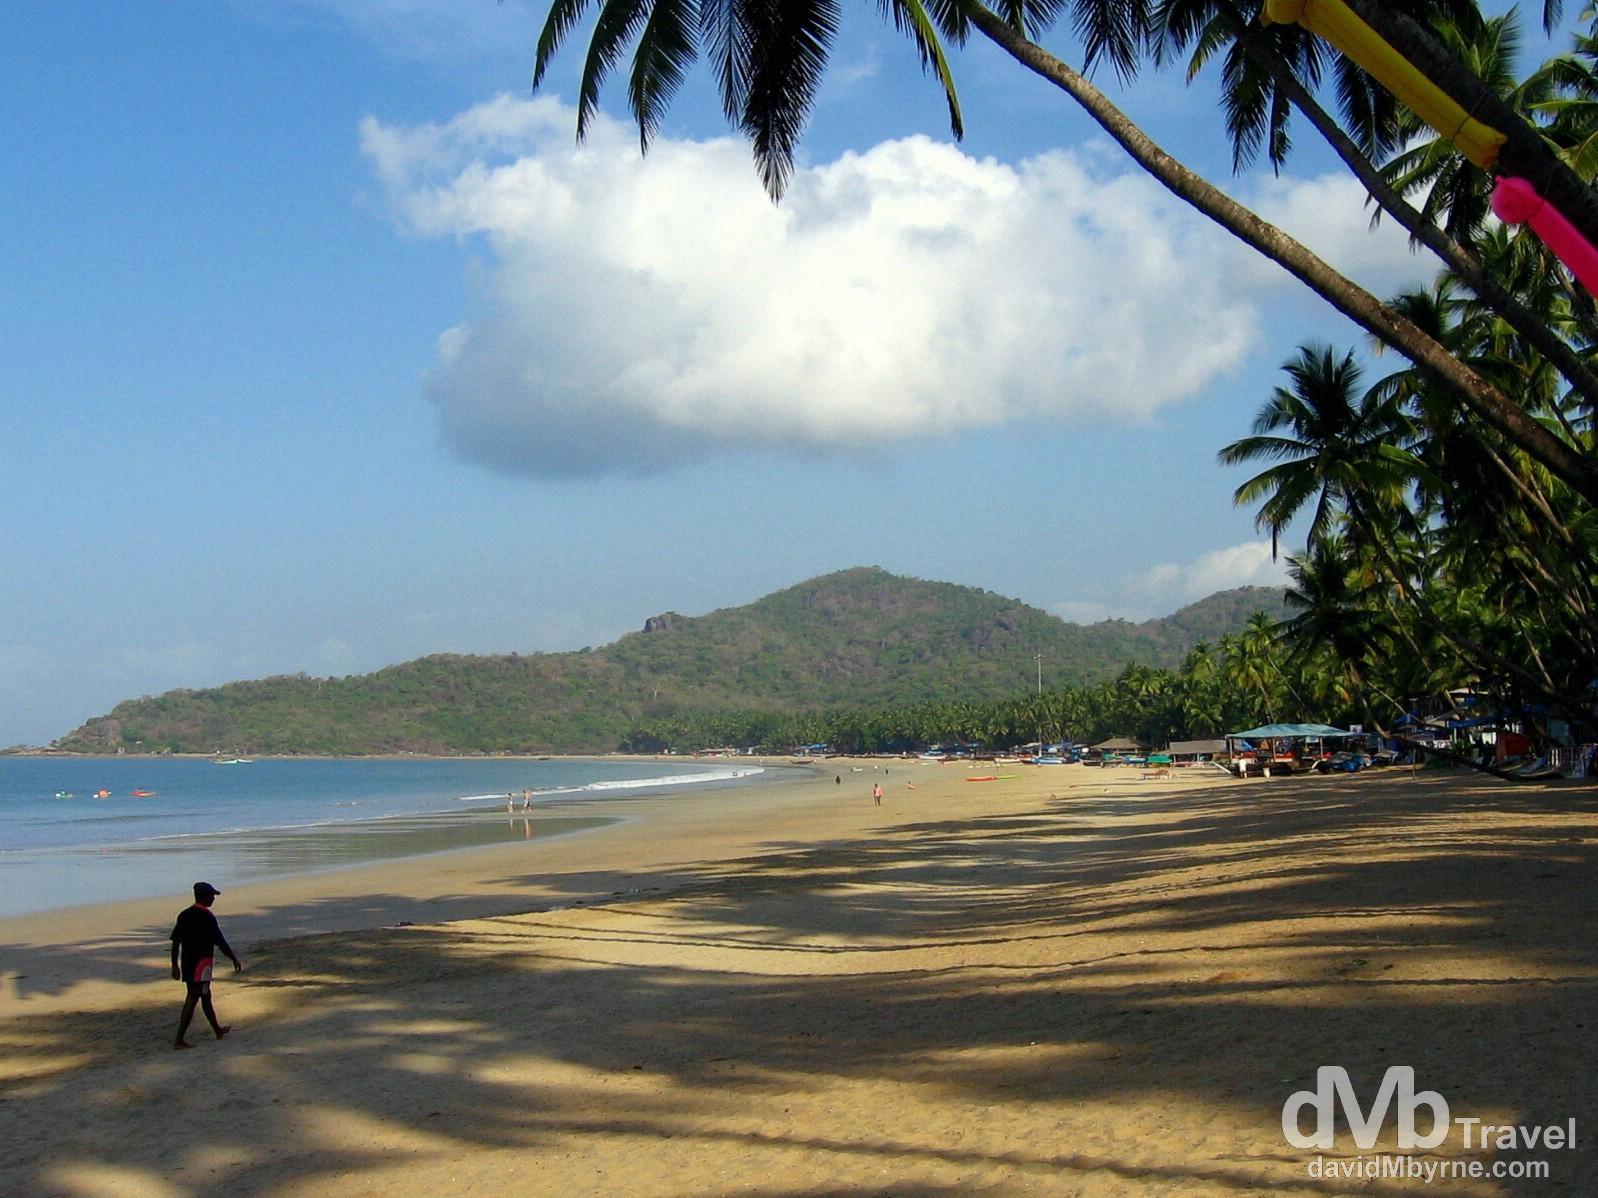 Palolem Beach, Goa, India. March 29, 2008.